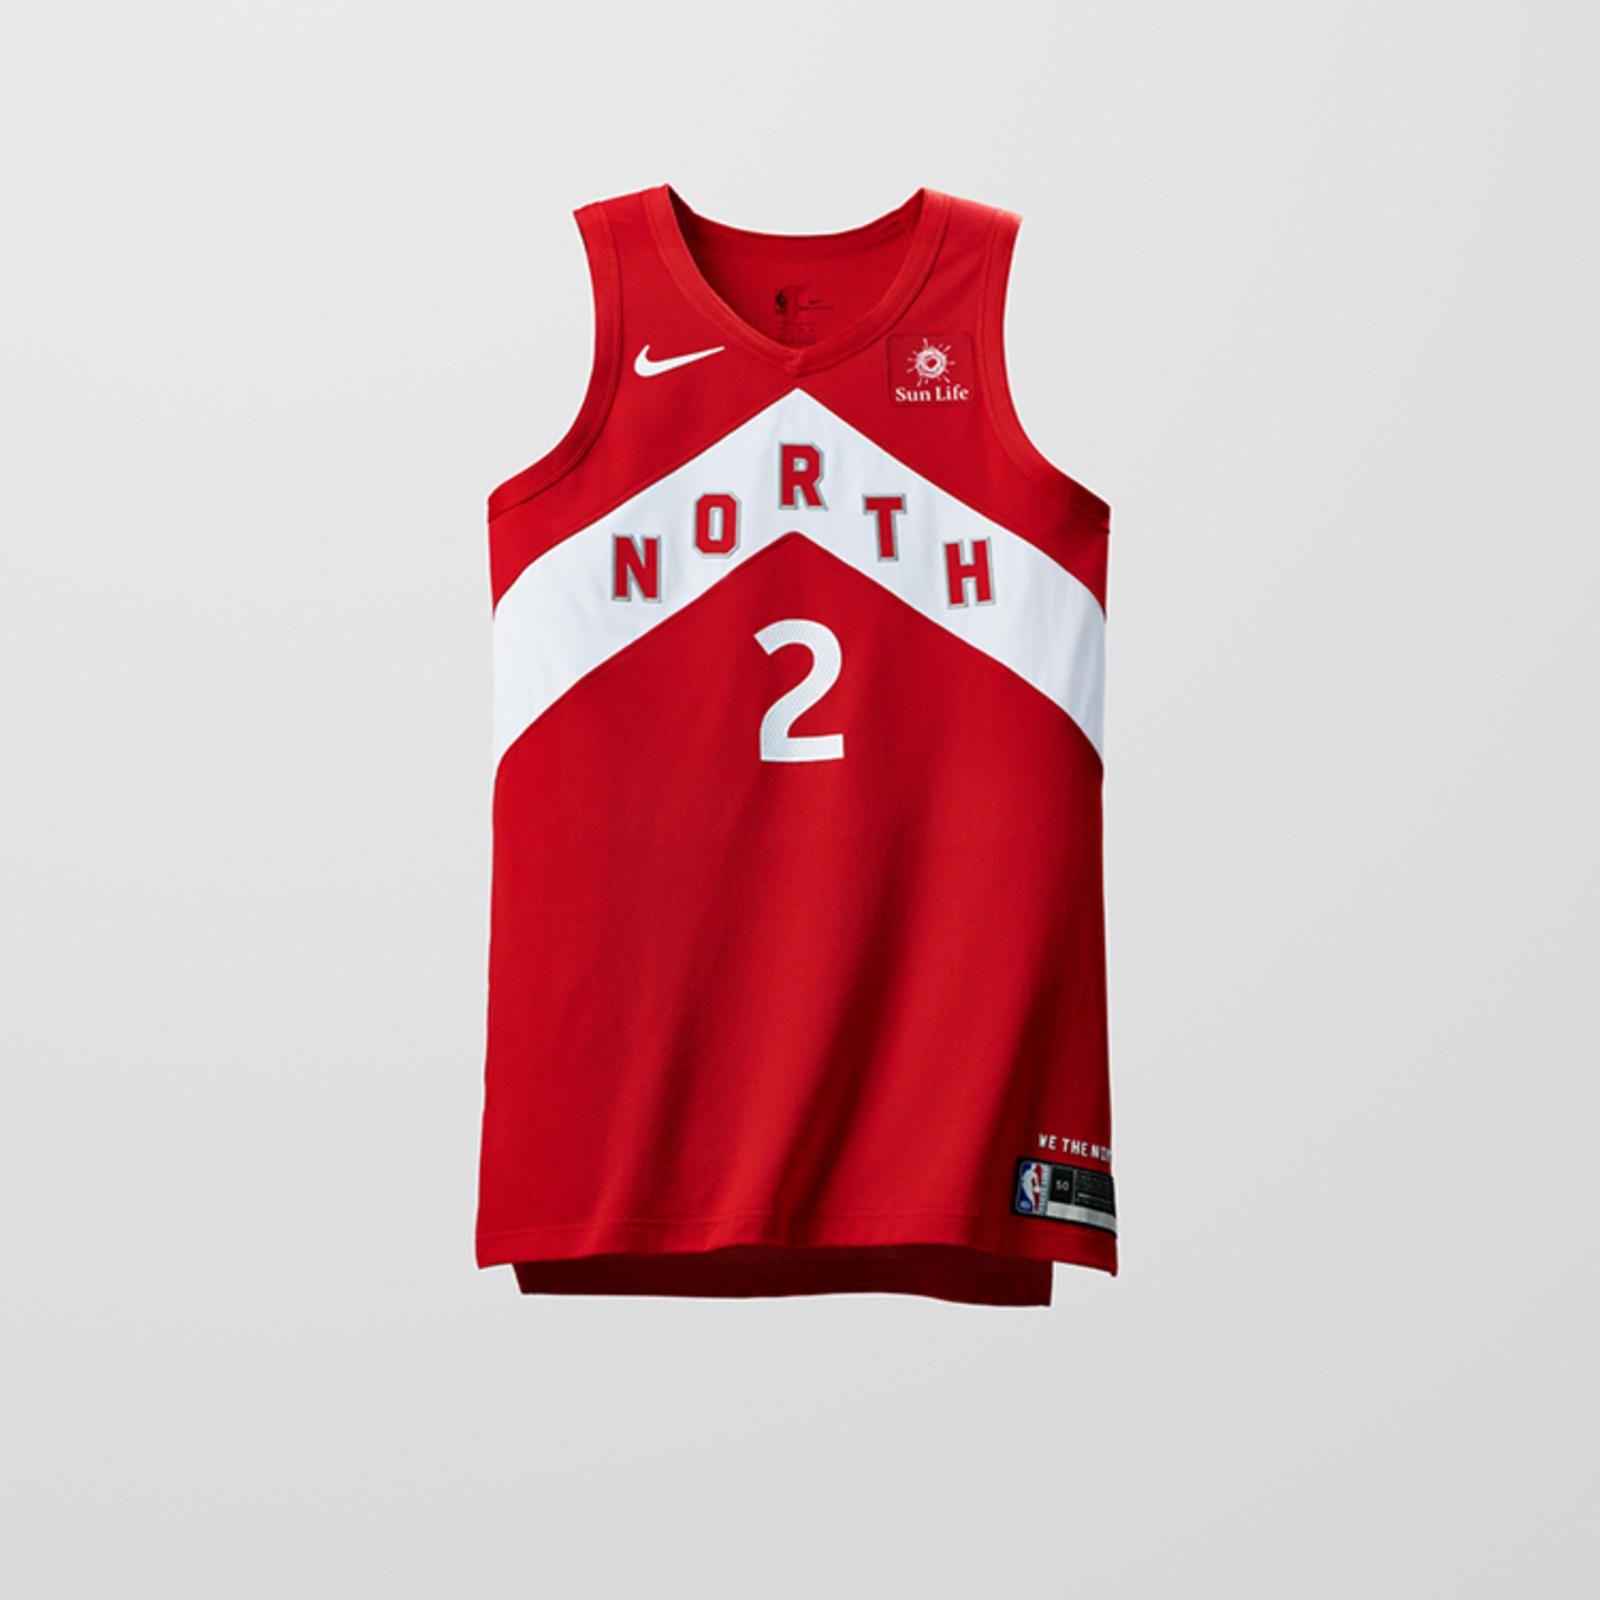 c31473731a782 Introducing the Nike NBA Earned Edition Uniforms | athletics | Nba ...